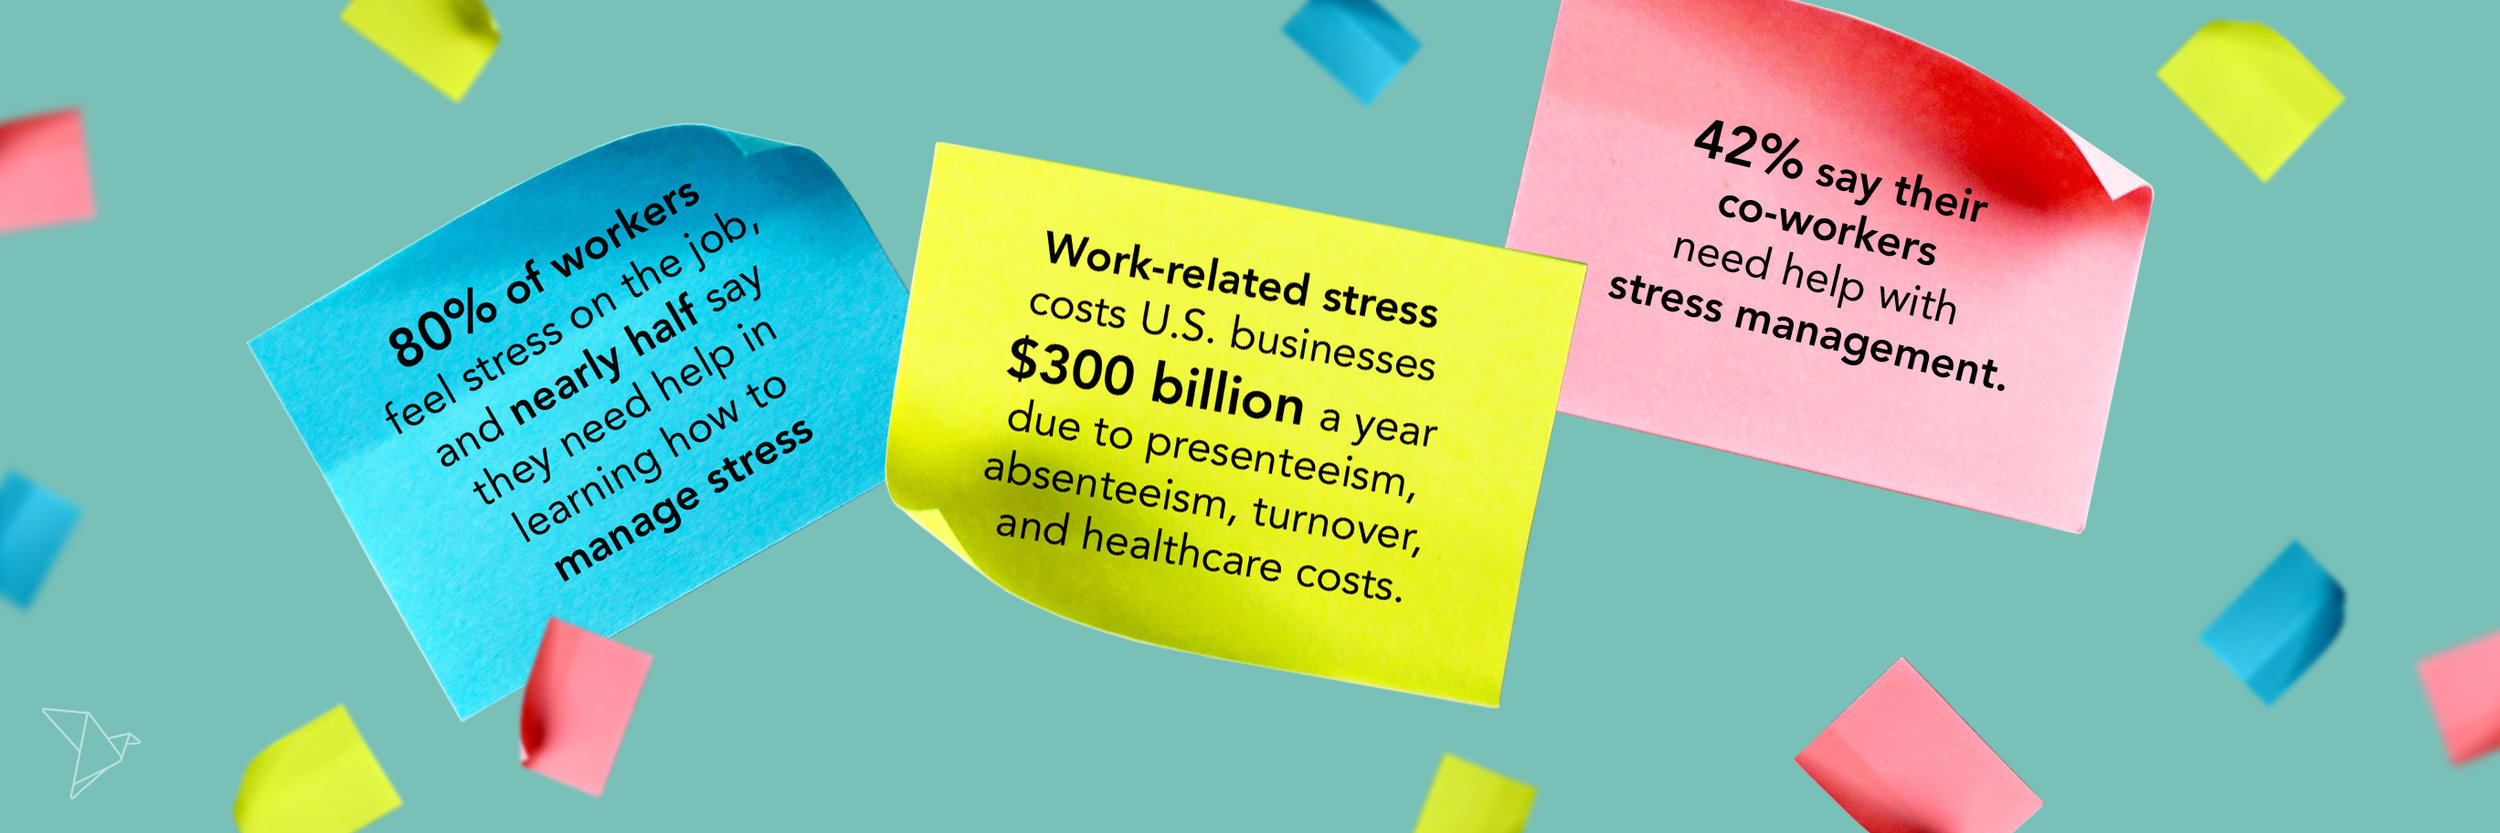 7 Ways Companies Fall Short on Stress Management \u2014 PSOCRATIC